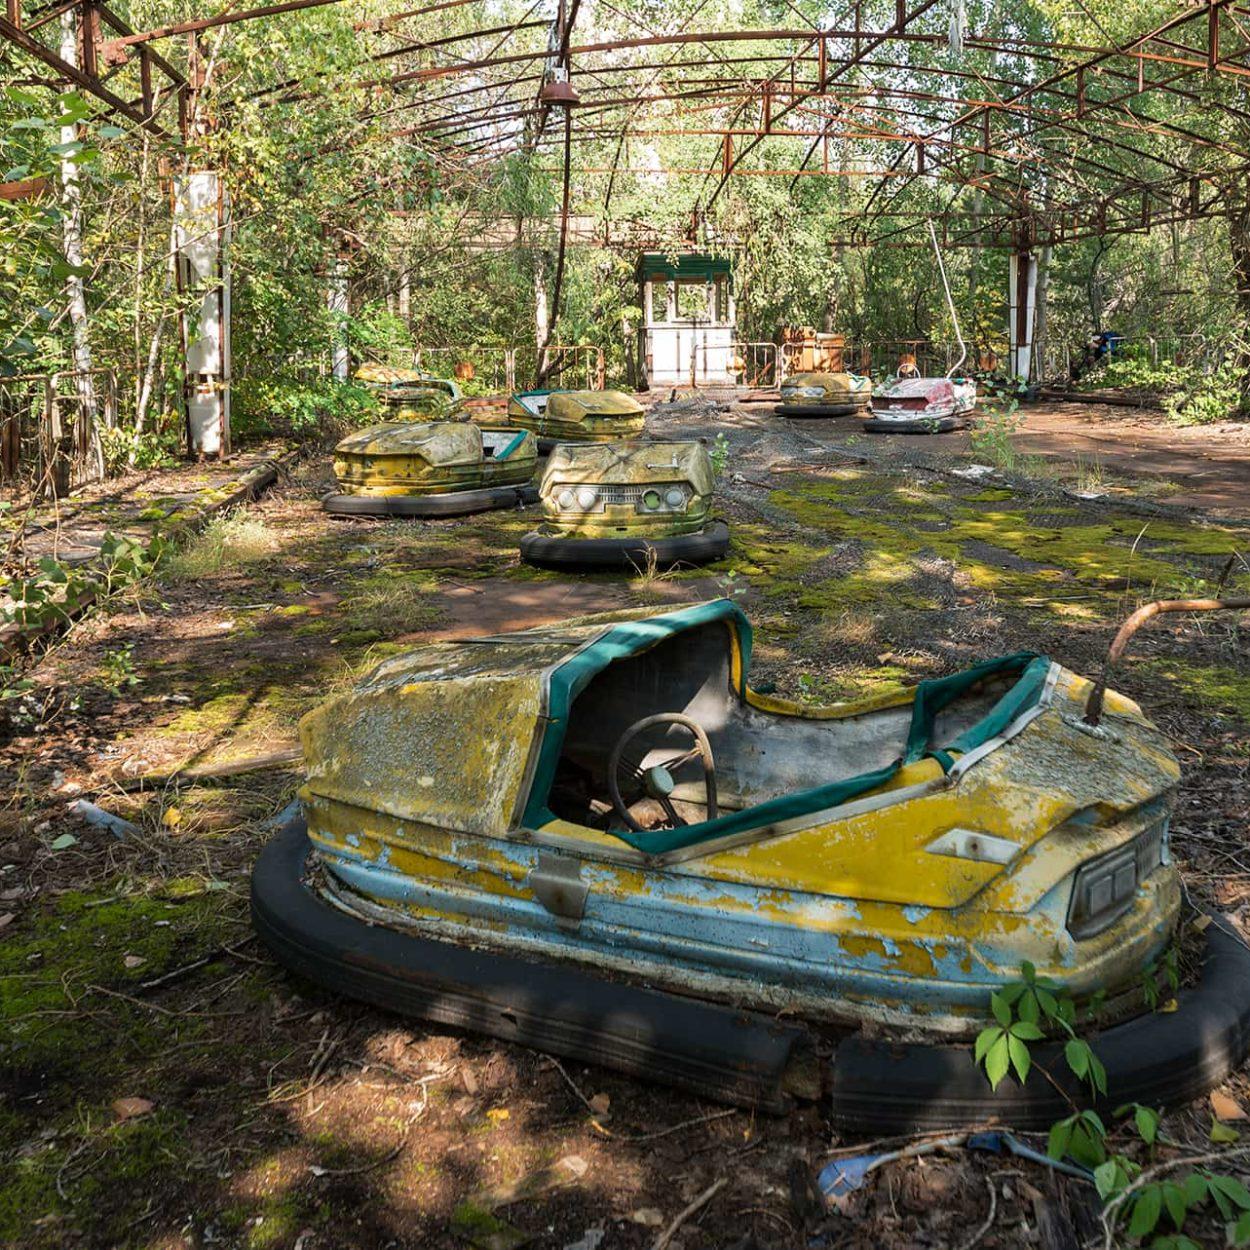 urbex-urban-exploration-ukraine-tchernobyl-pripiat-fete-voiture-tamponneuse